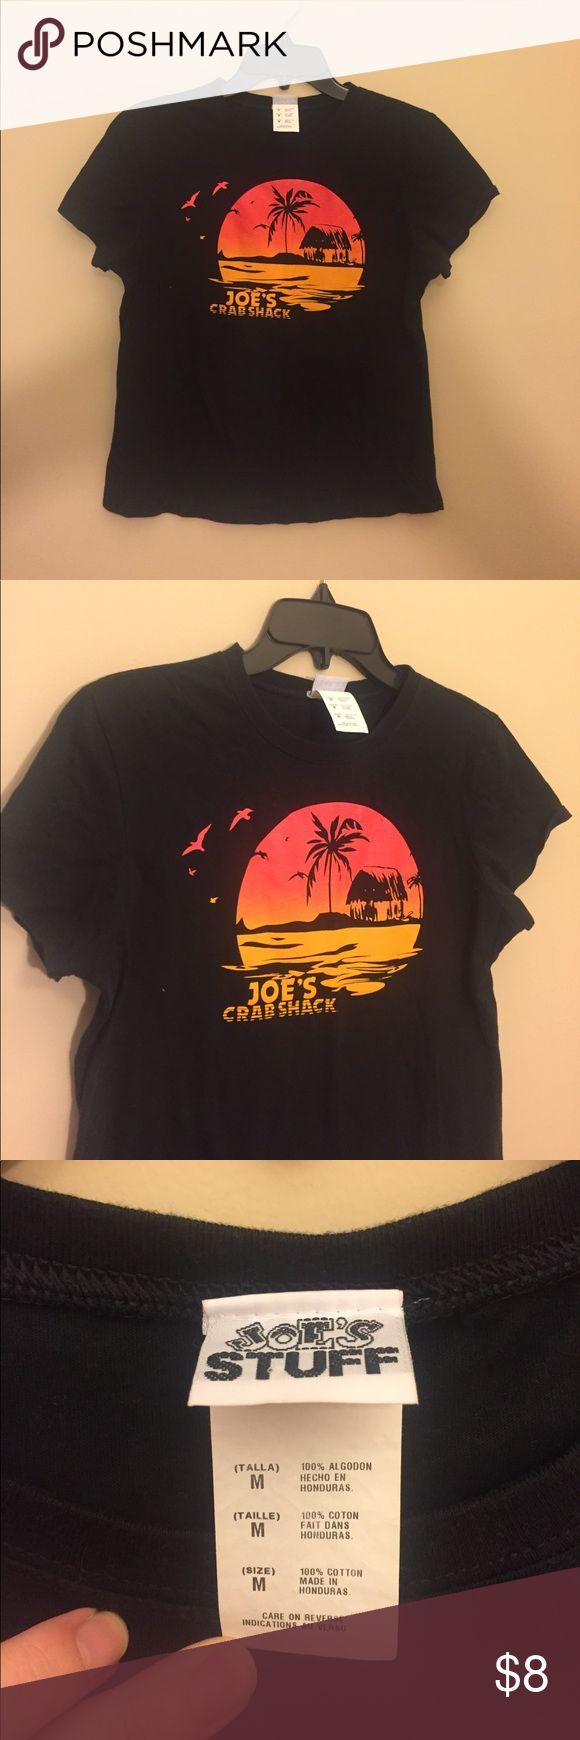 Joe's Crab Shack shirt Size medium Tops